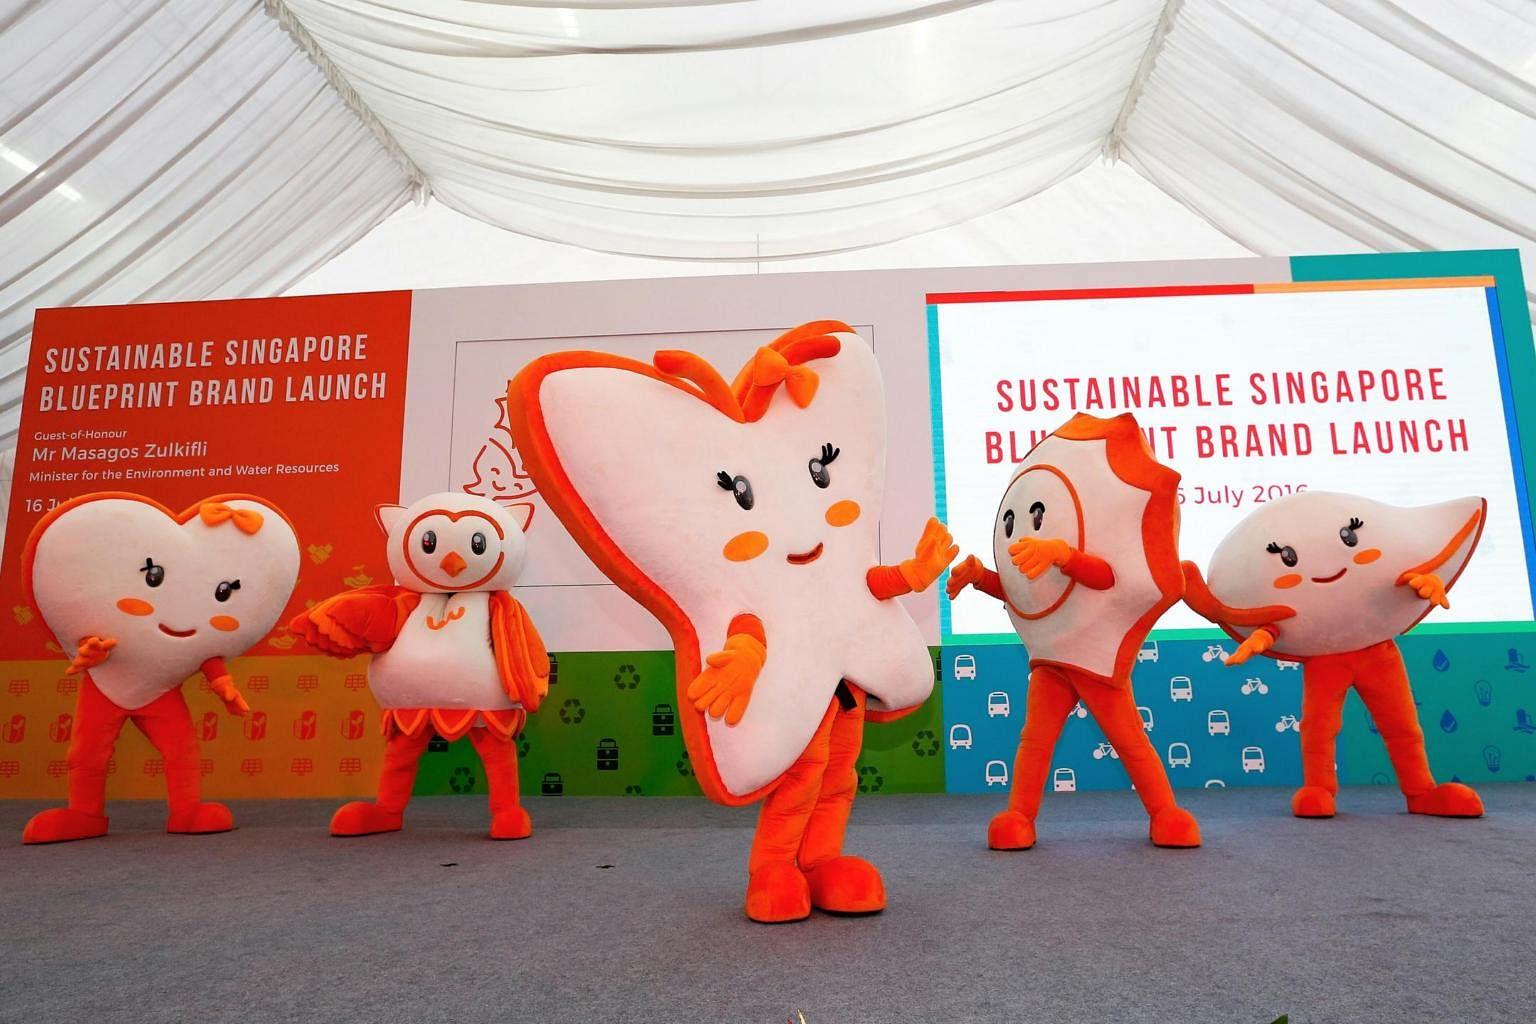 5 mascots to urge citizens to adopt greener ways singapore news 5 mascots to urge citizens to adopt greener ways singapore news top stories the straits times malvernweather Choice Image